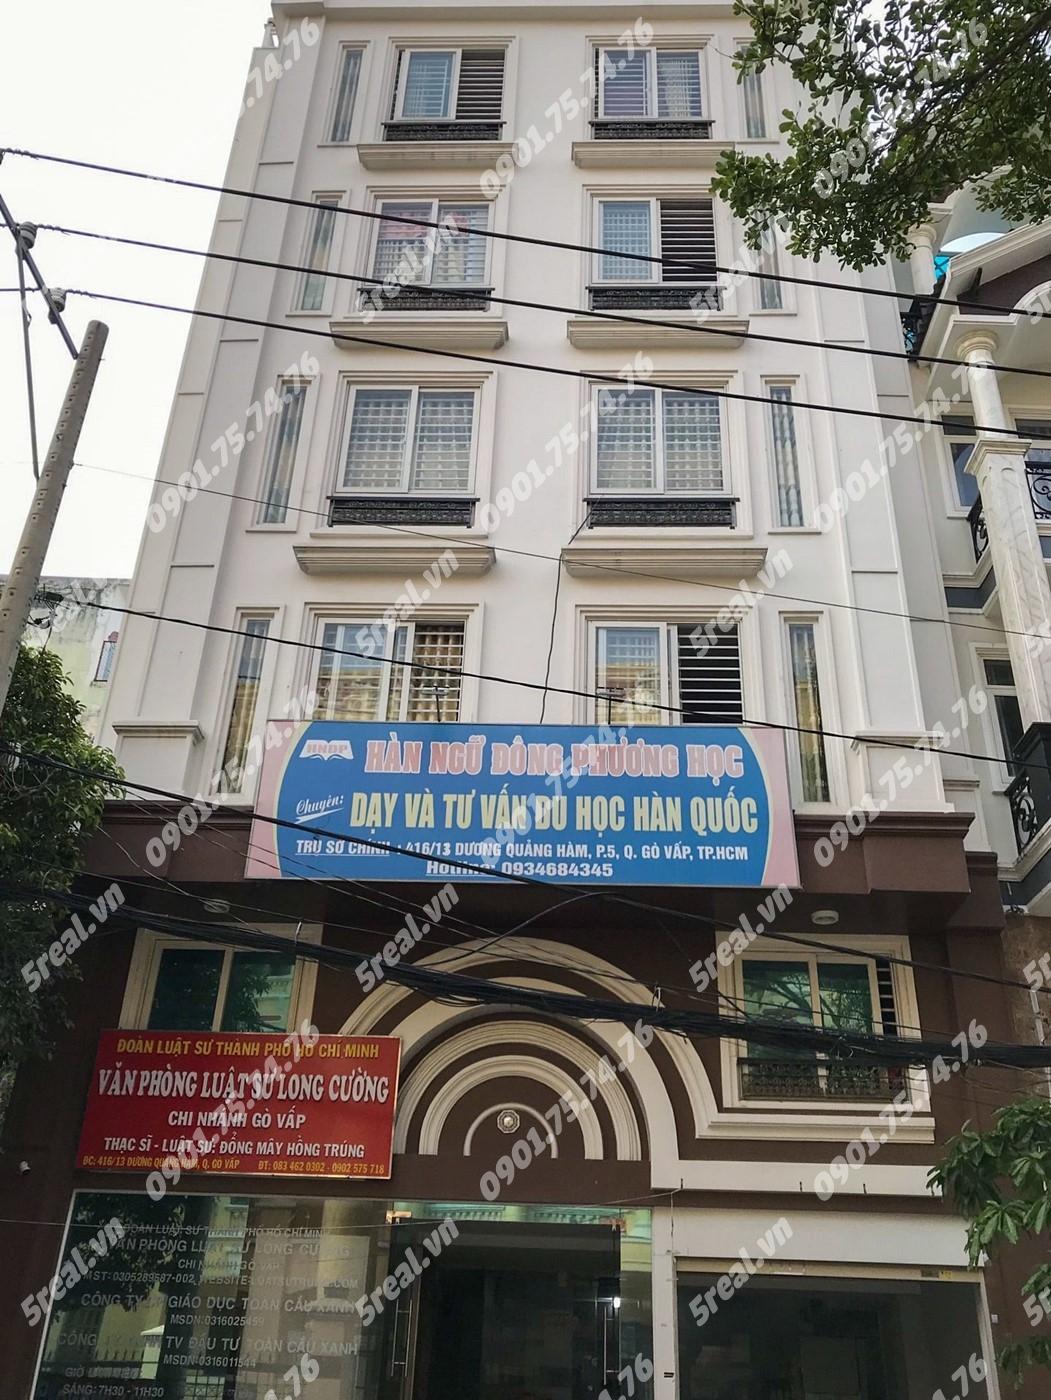 duong-quang-ham-building-quan-go-vap-van-phong-cho-thue-5real.vn-01